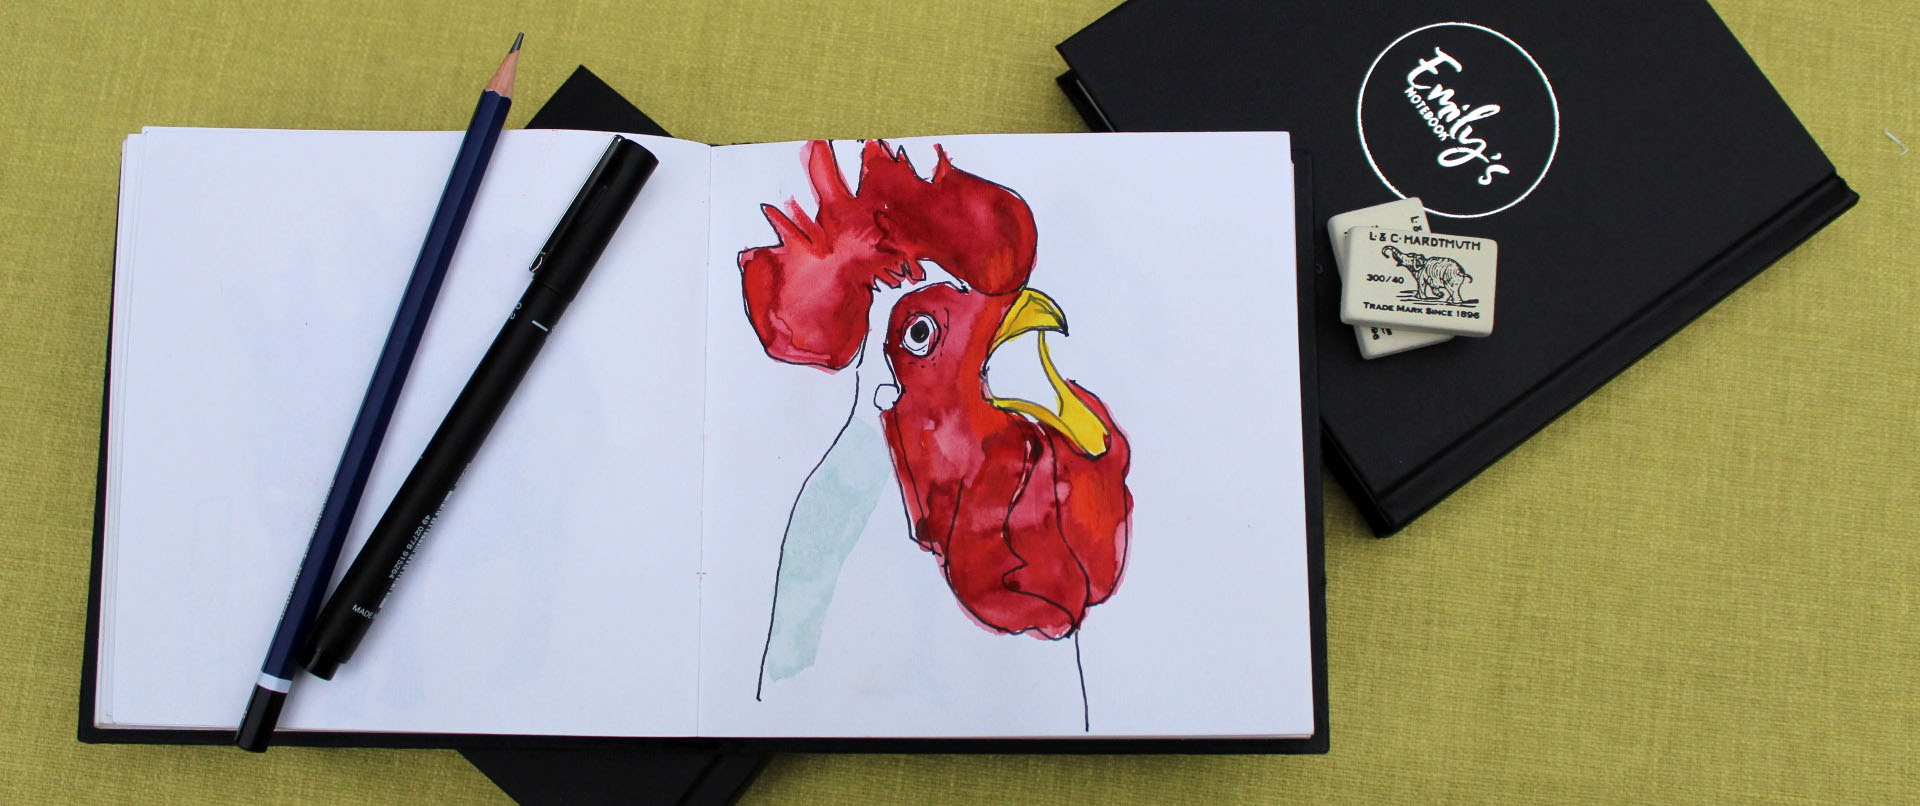 sketch from scratch